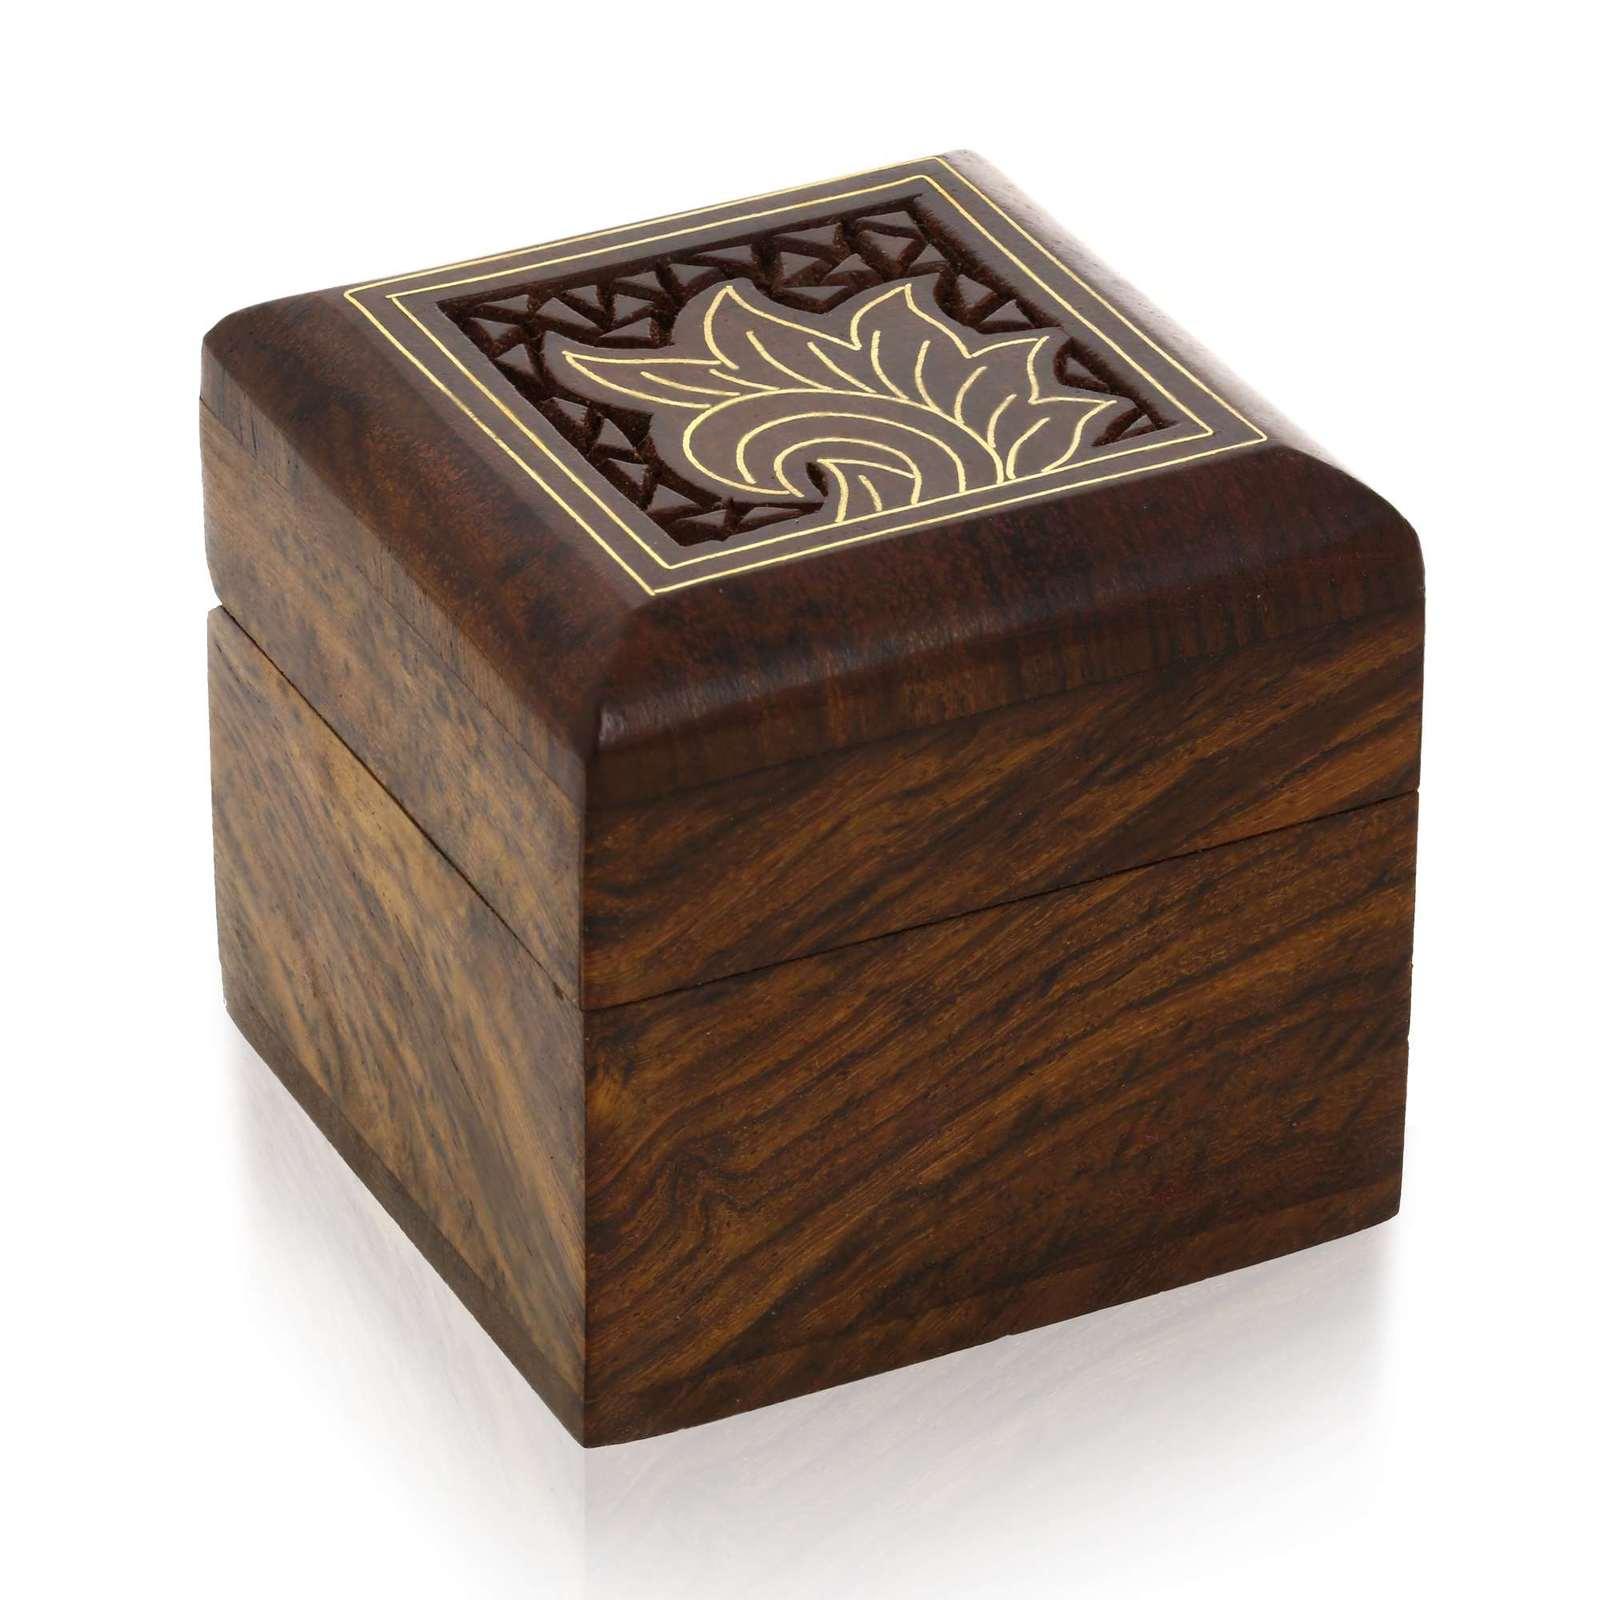 box for rings earrings toe rings cufflinks small jewelry